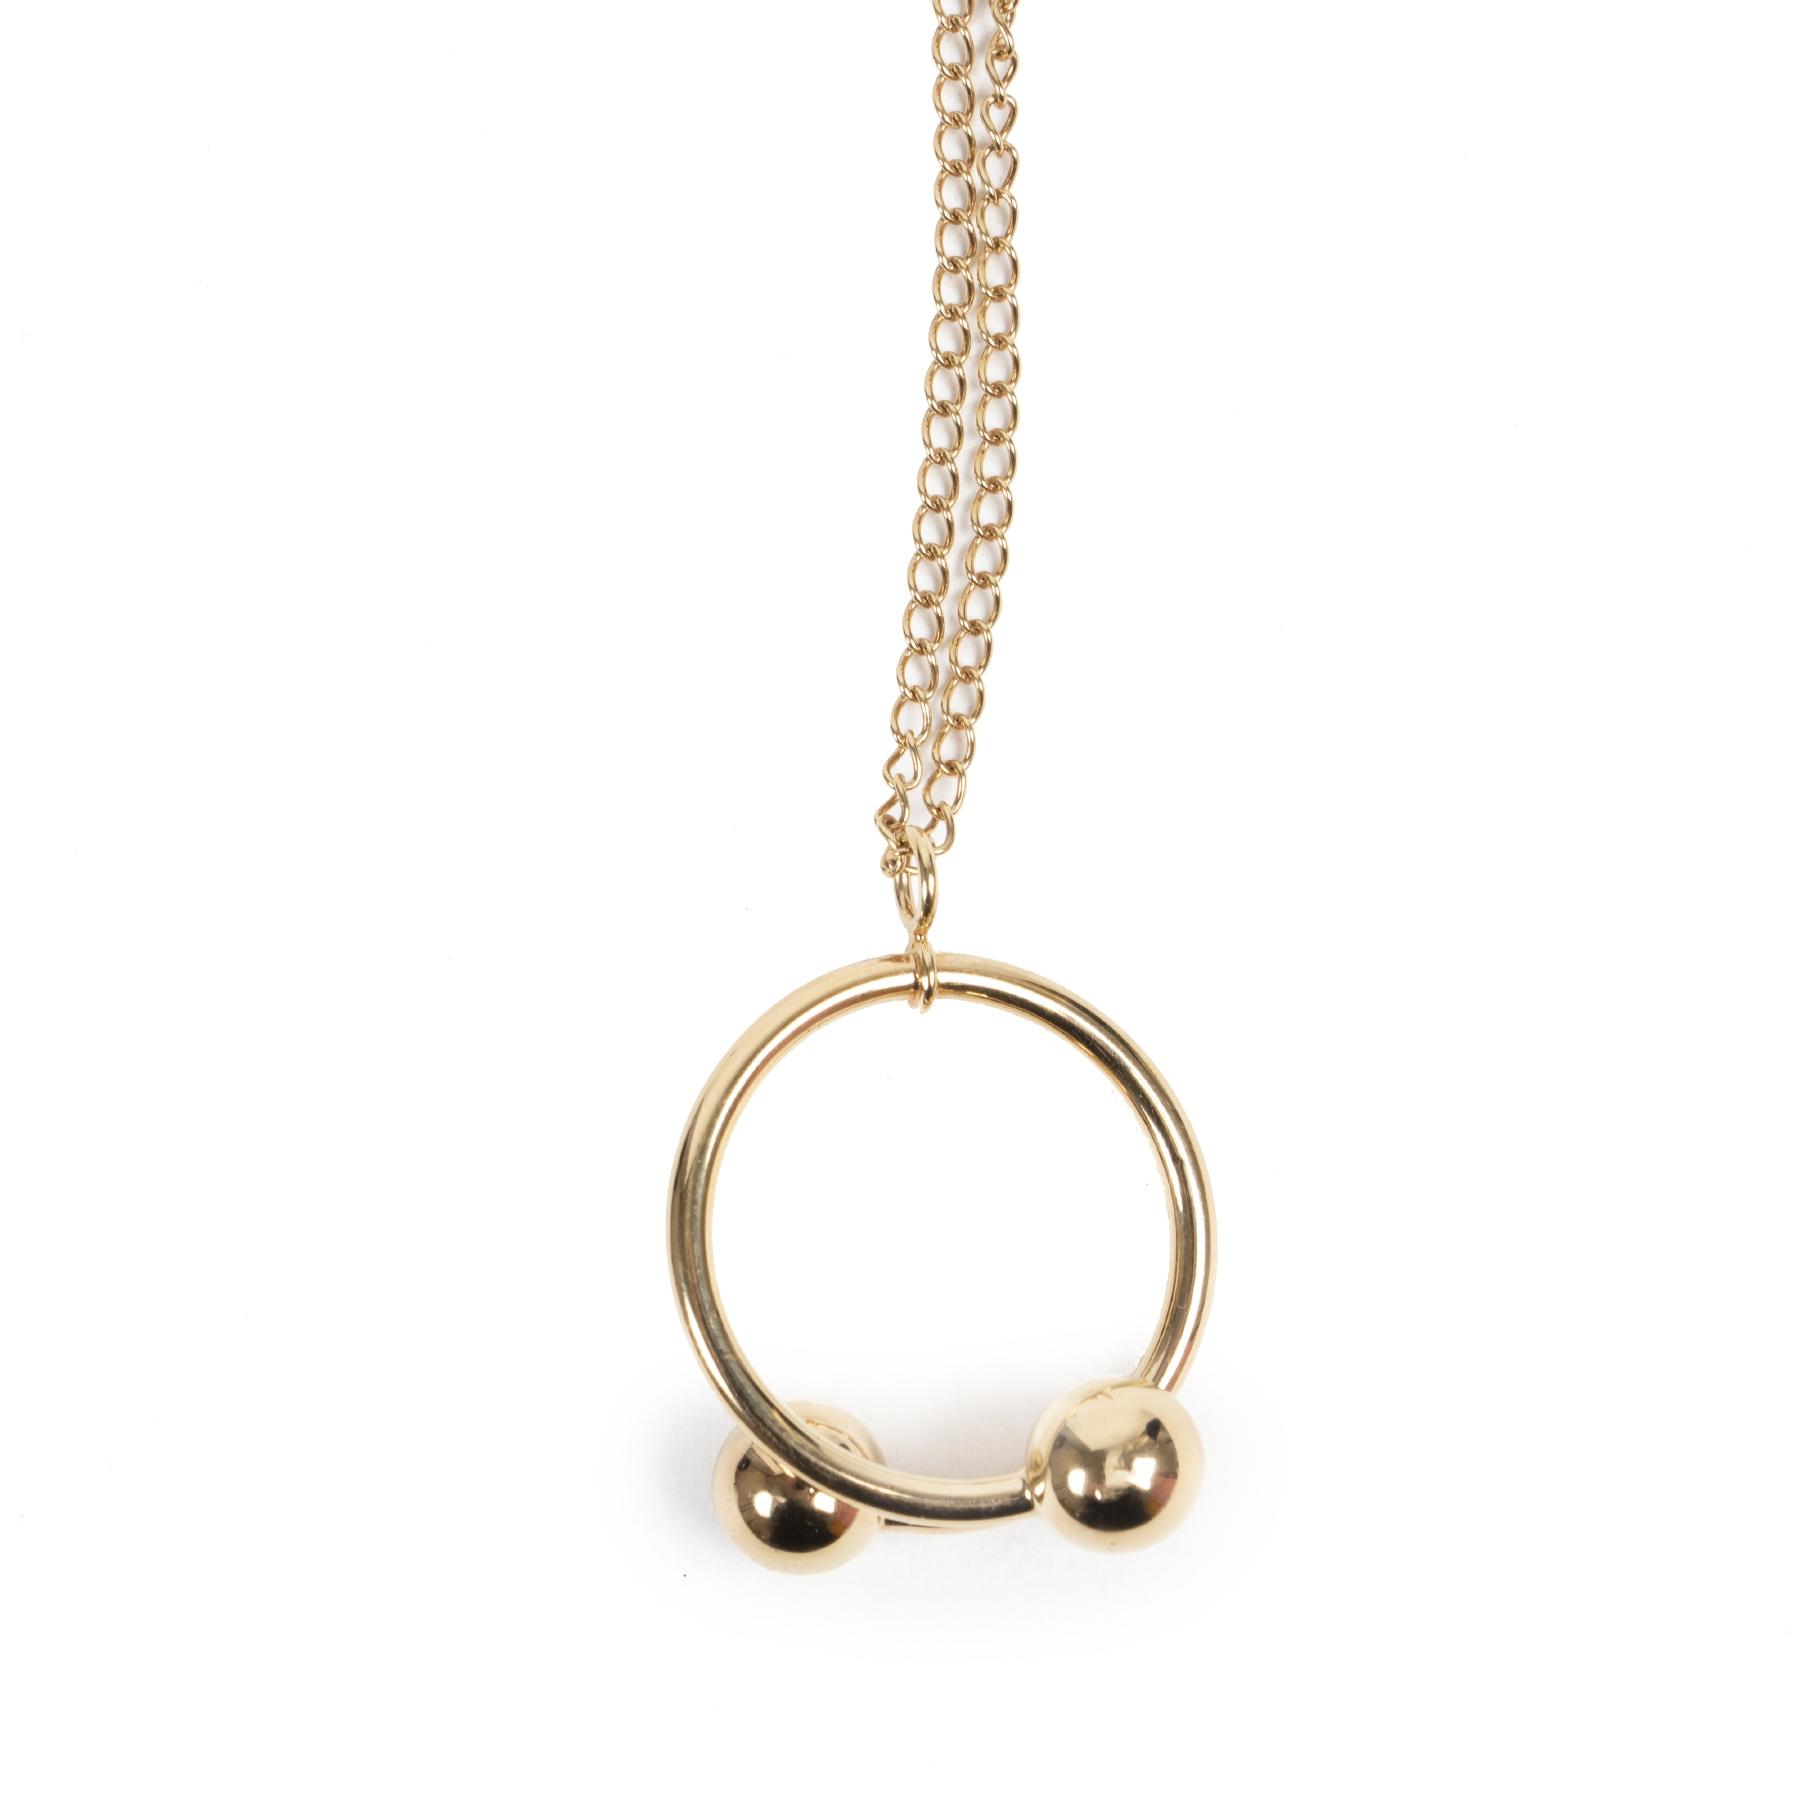 Authentic secondhand J.W. Anderson Golden Double Ball Pendant Necklace designer accessories fashion luxury vintage webshop safe secure online shopping